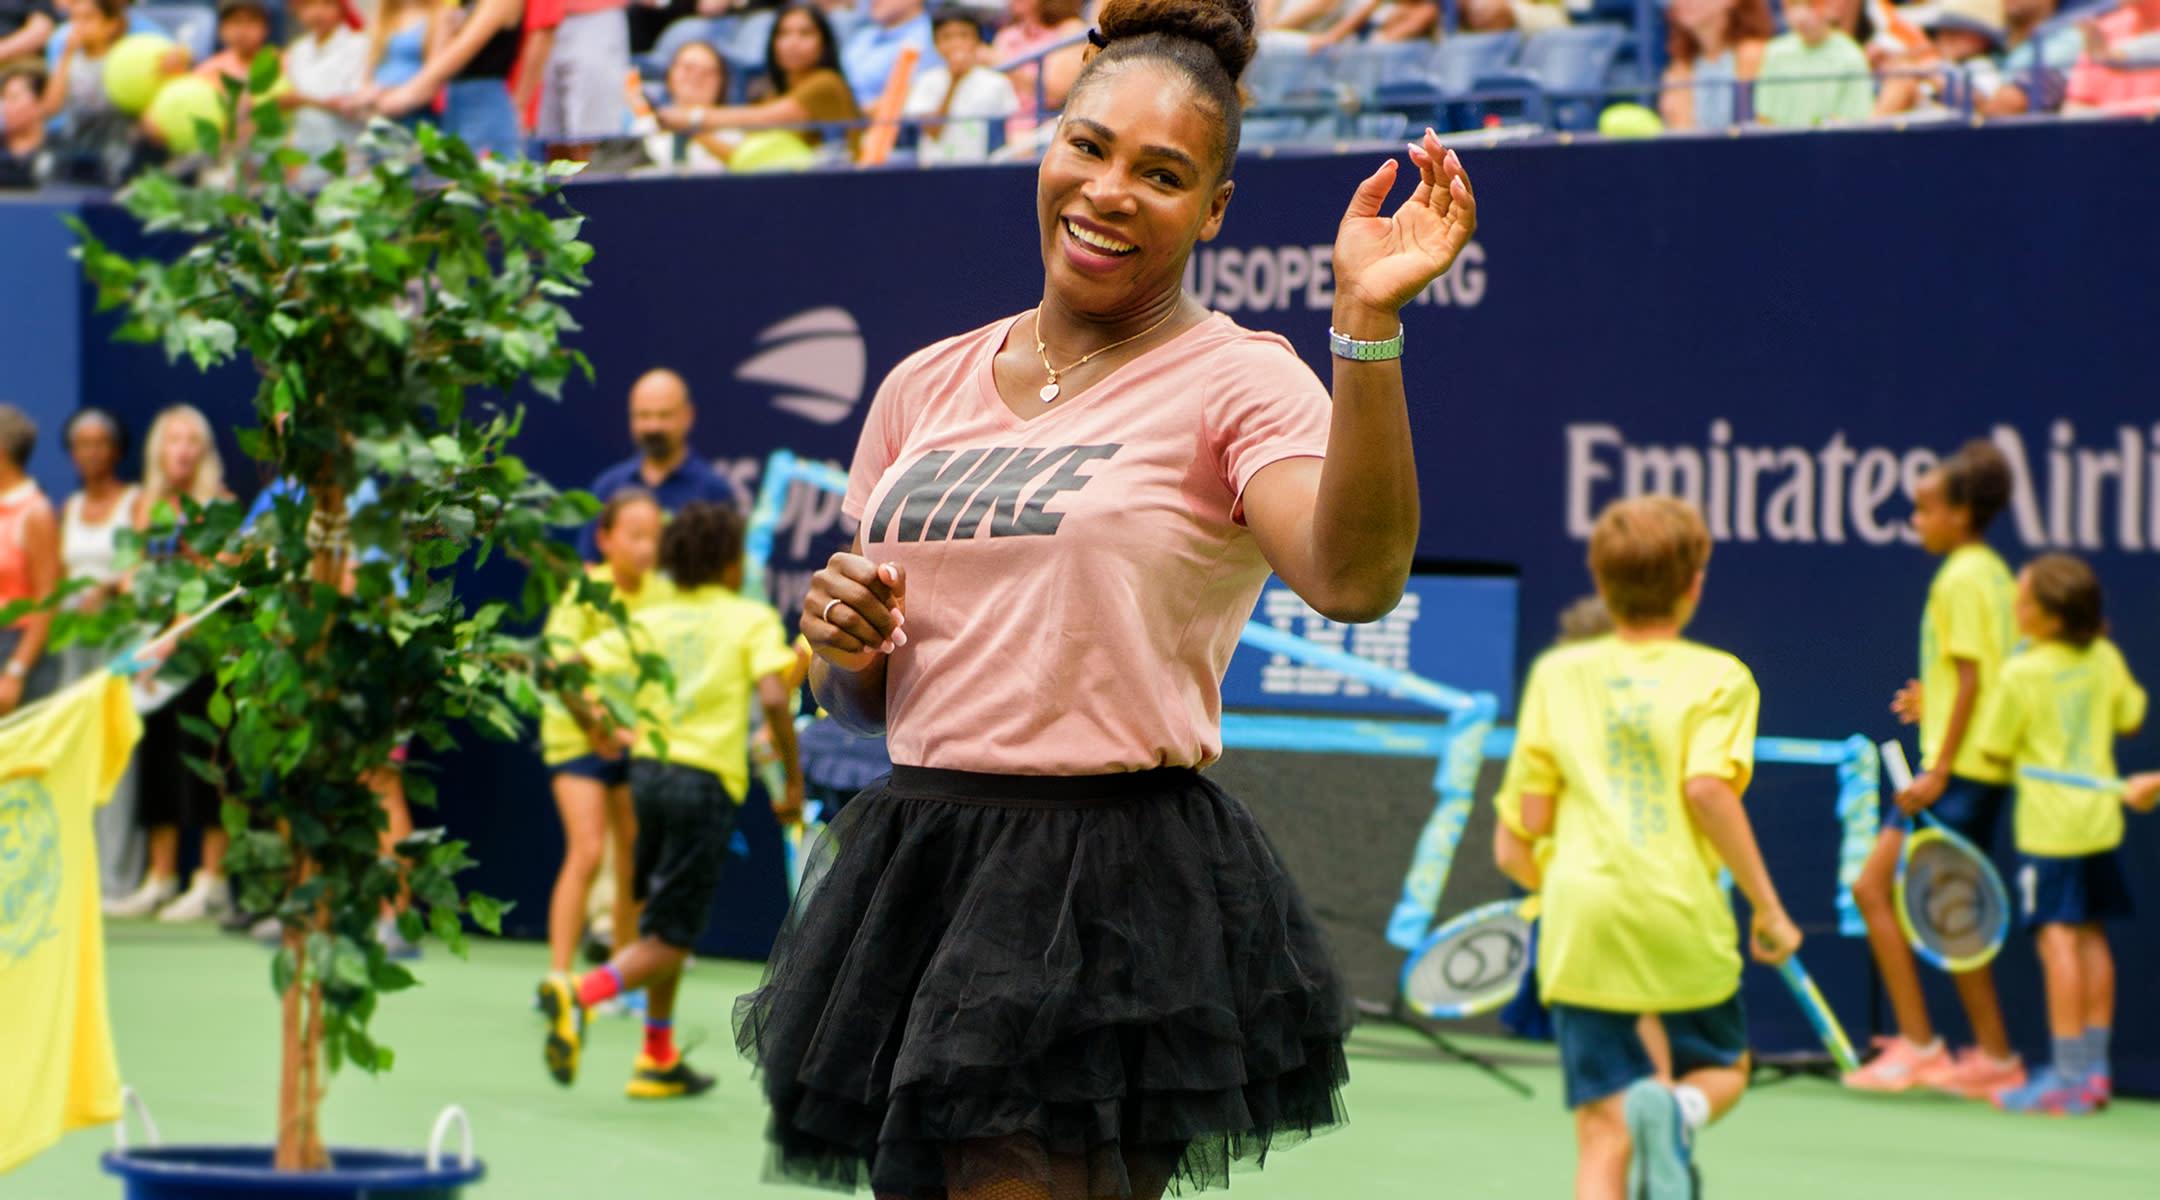 serena williams at tennis match laughing and wearing tutu